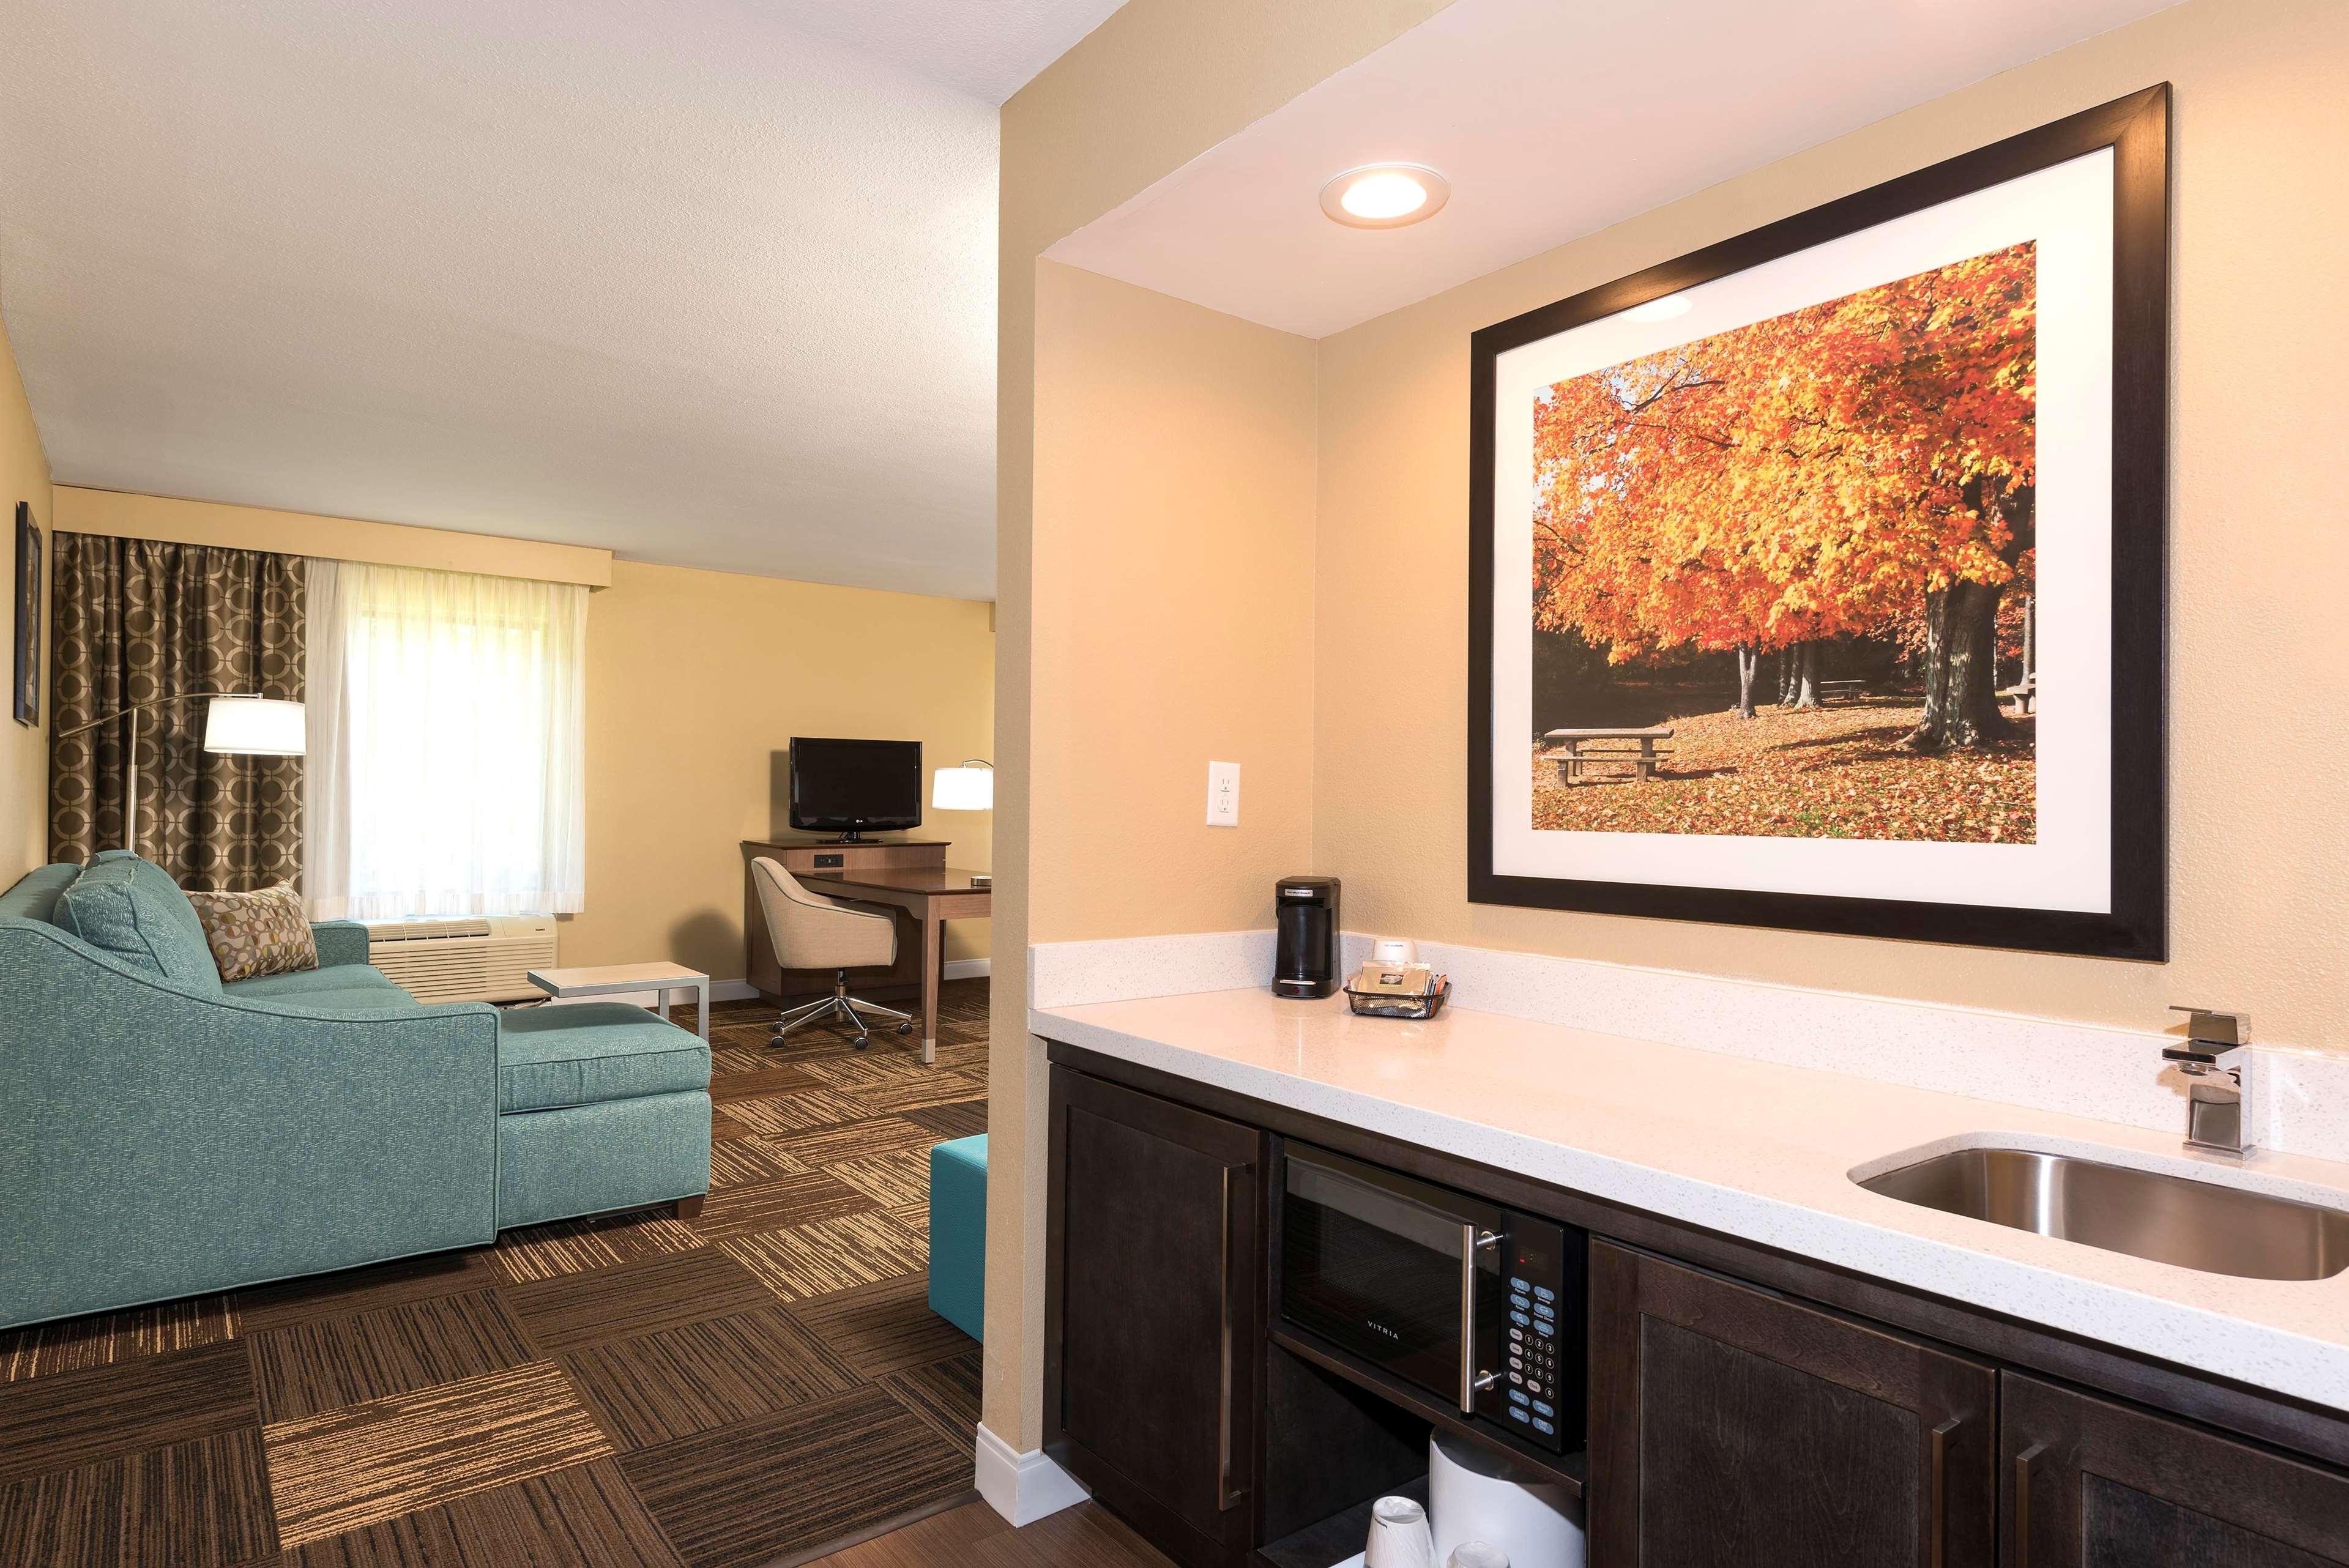 Hampton Inn & Suites Mansfield-South @ I-71 image 10